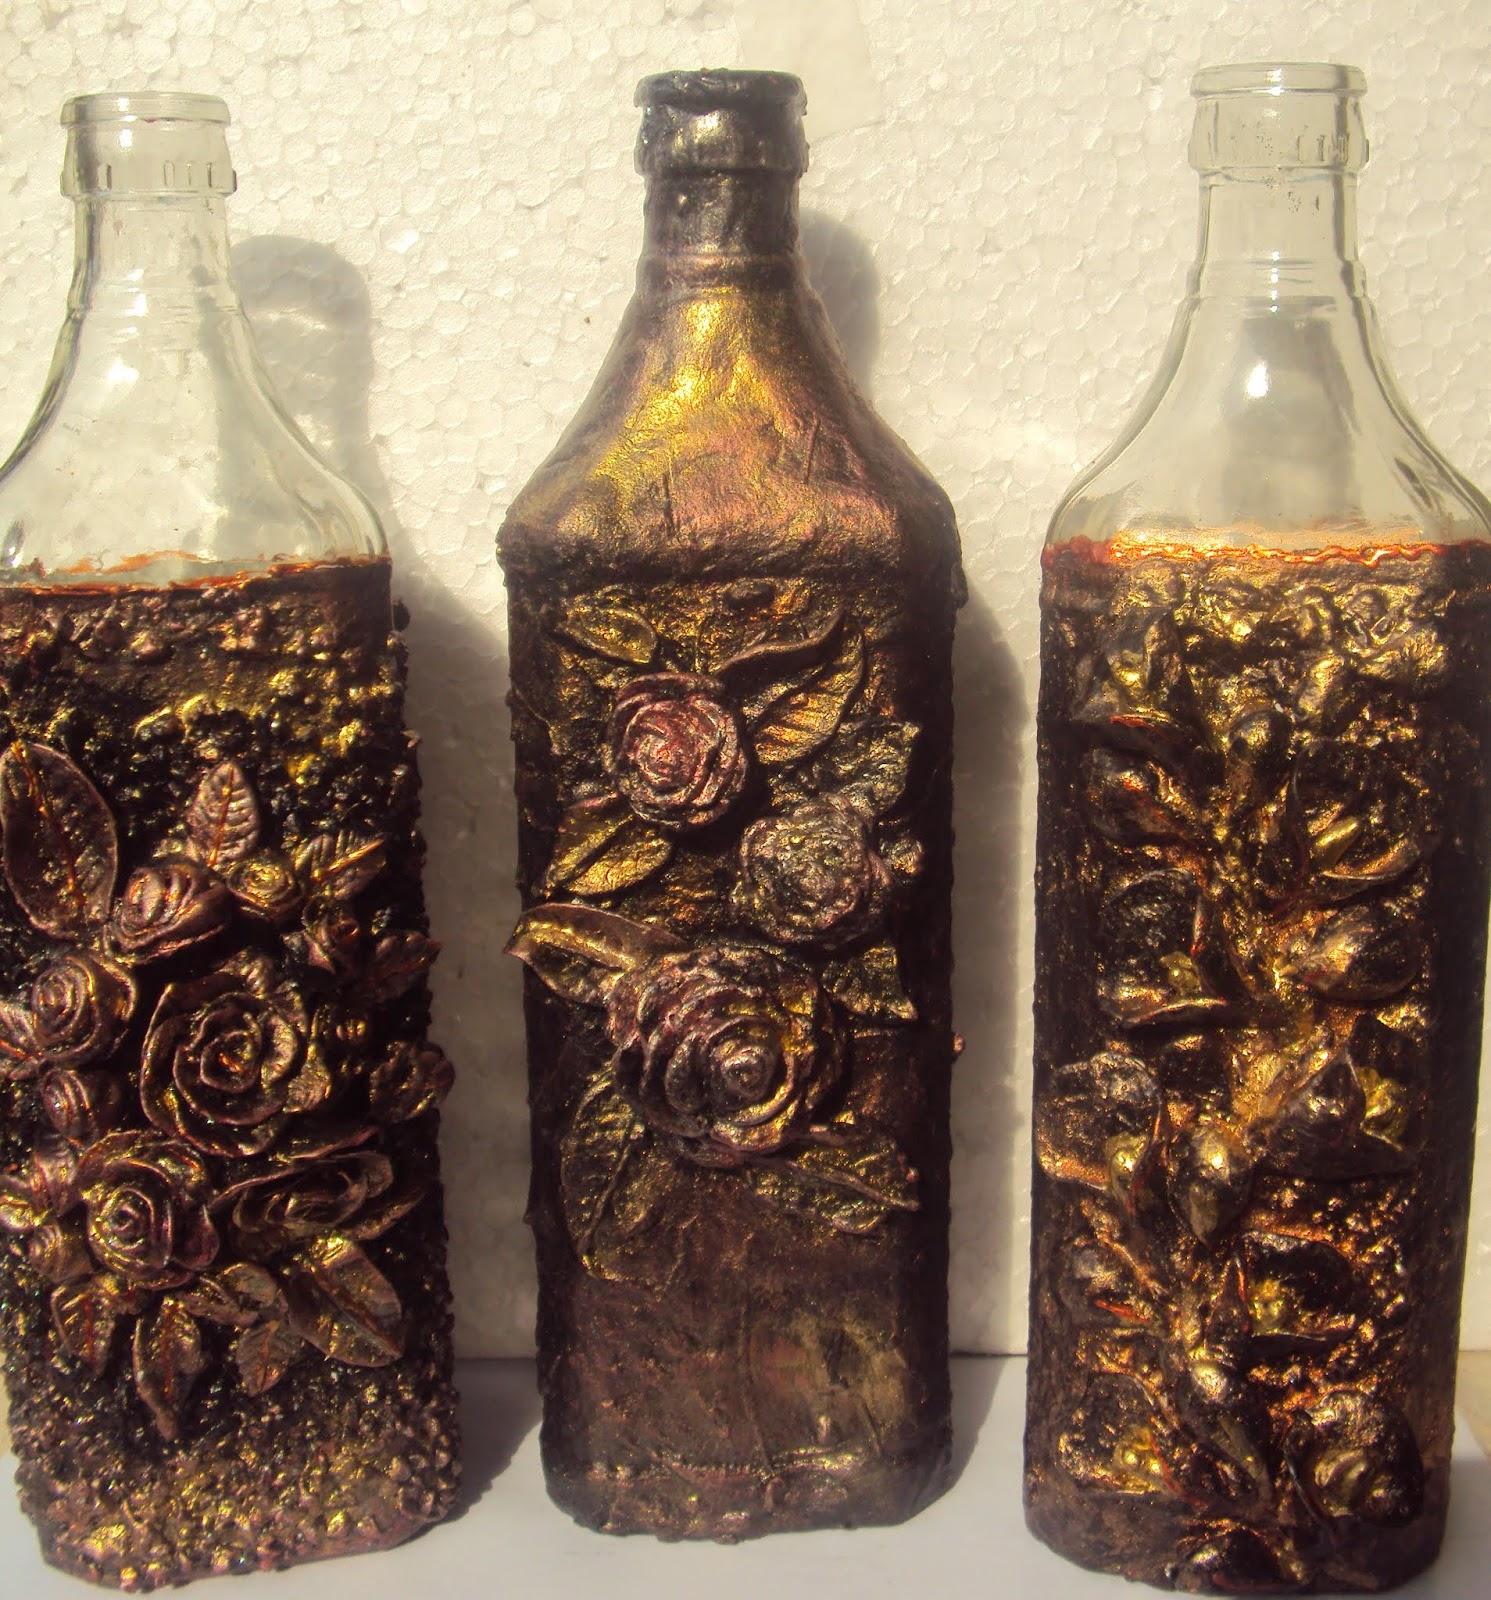 Aesthetics In Art And Design A Set Of ThreeAltered Bottles Tutorial